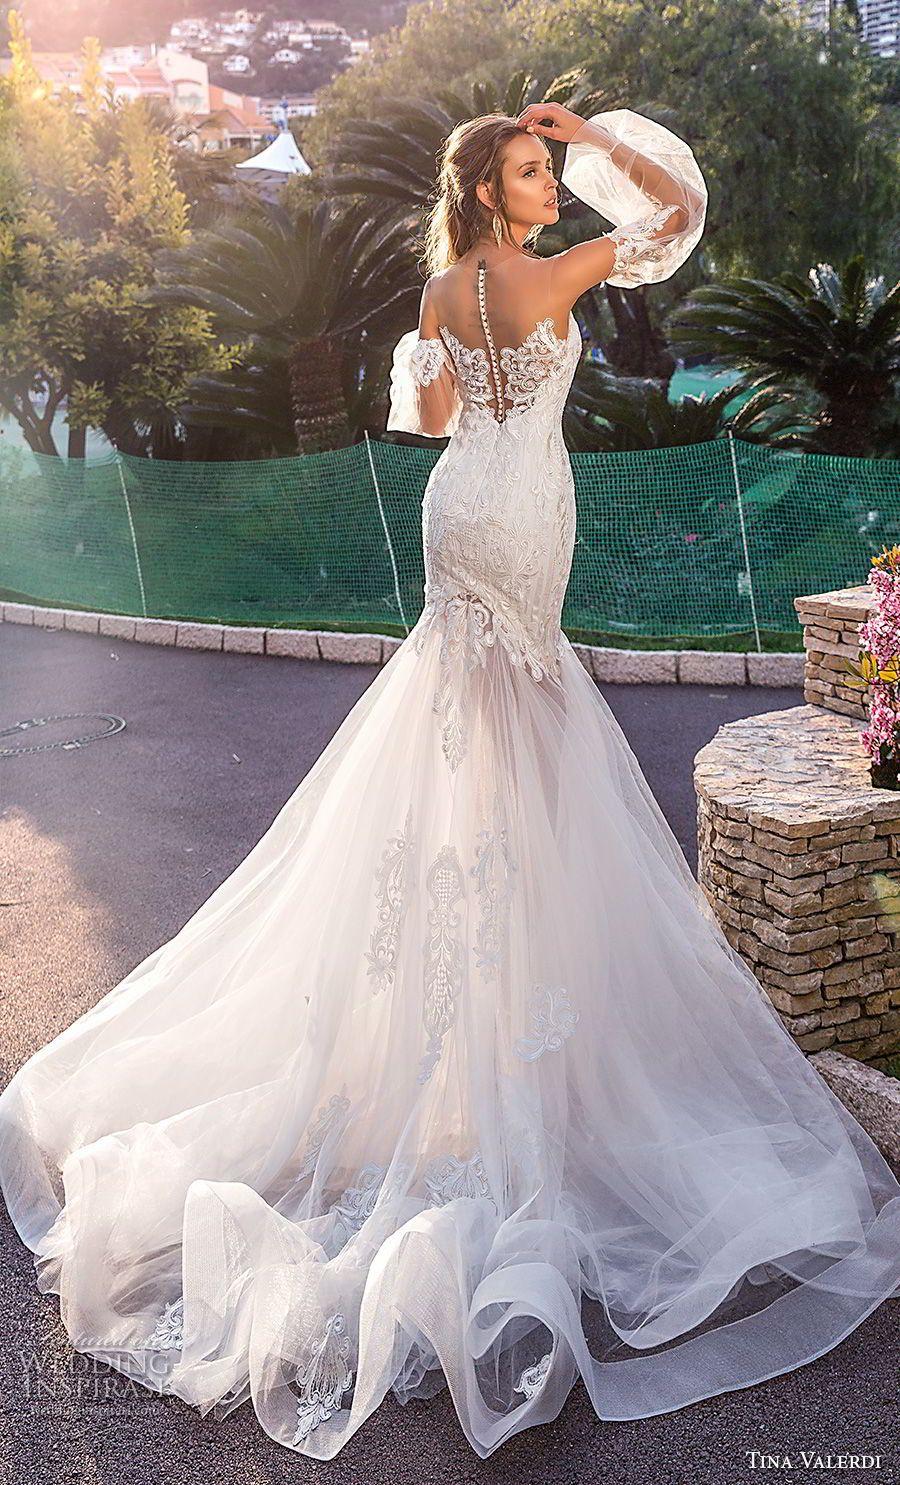 Lace t shirt wedding dress november 2018 Tina Valerdi  Wedding Dresses u ucIum Yoursud Bridal Collection